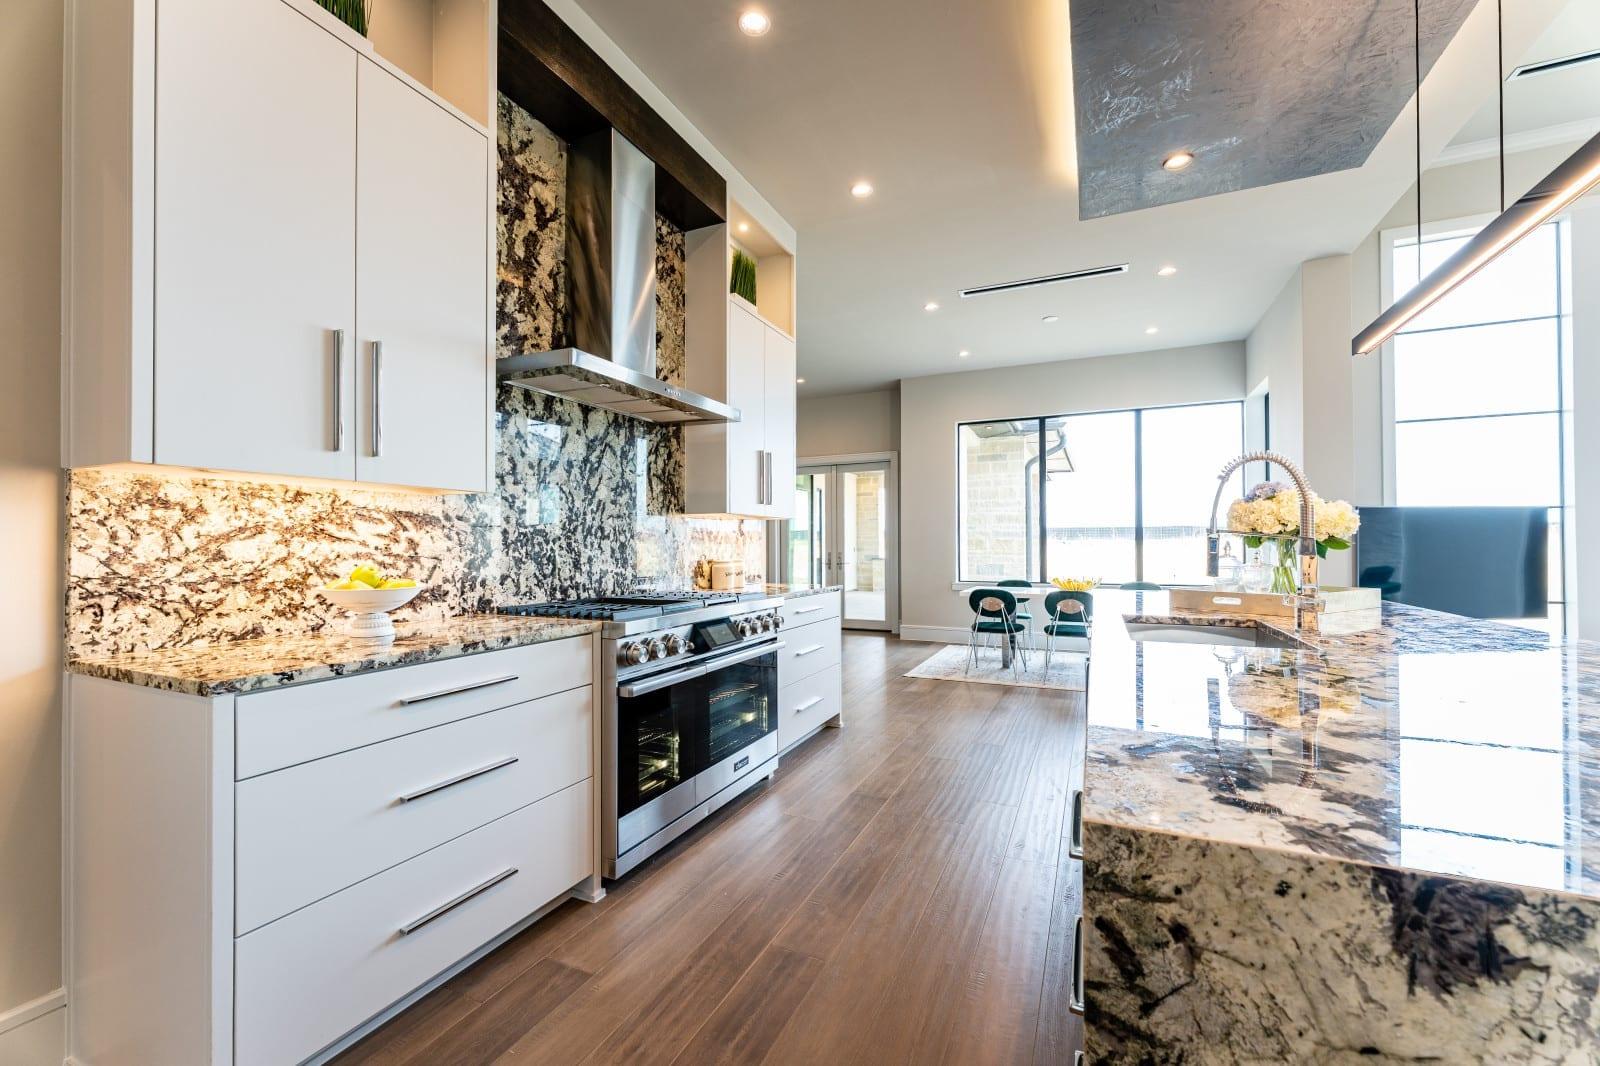 Modern Style Homes design # 15 - Millennial Design + Build